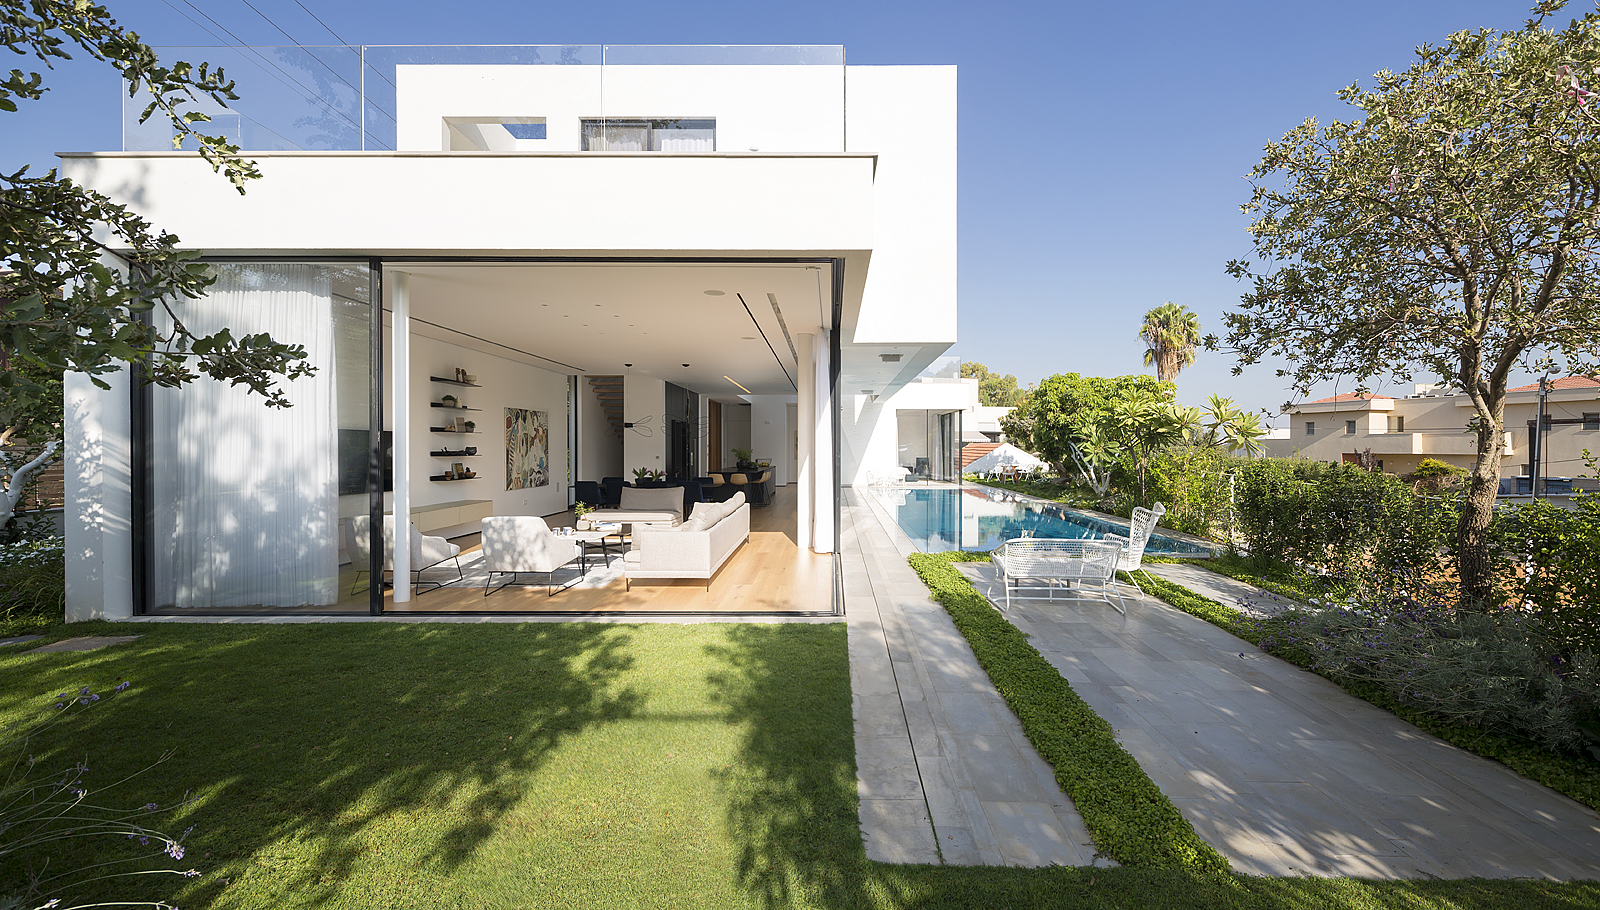 LB House / Shachar- Rozenfeld architects